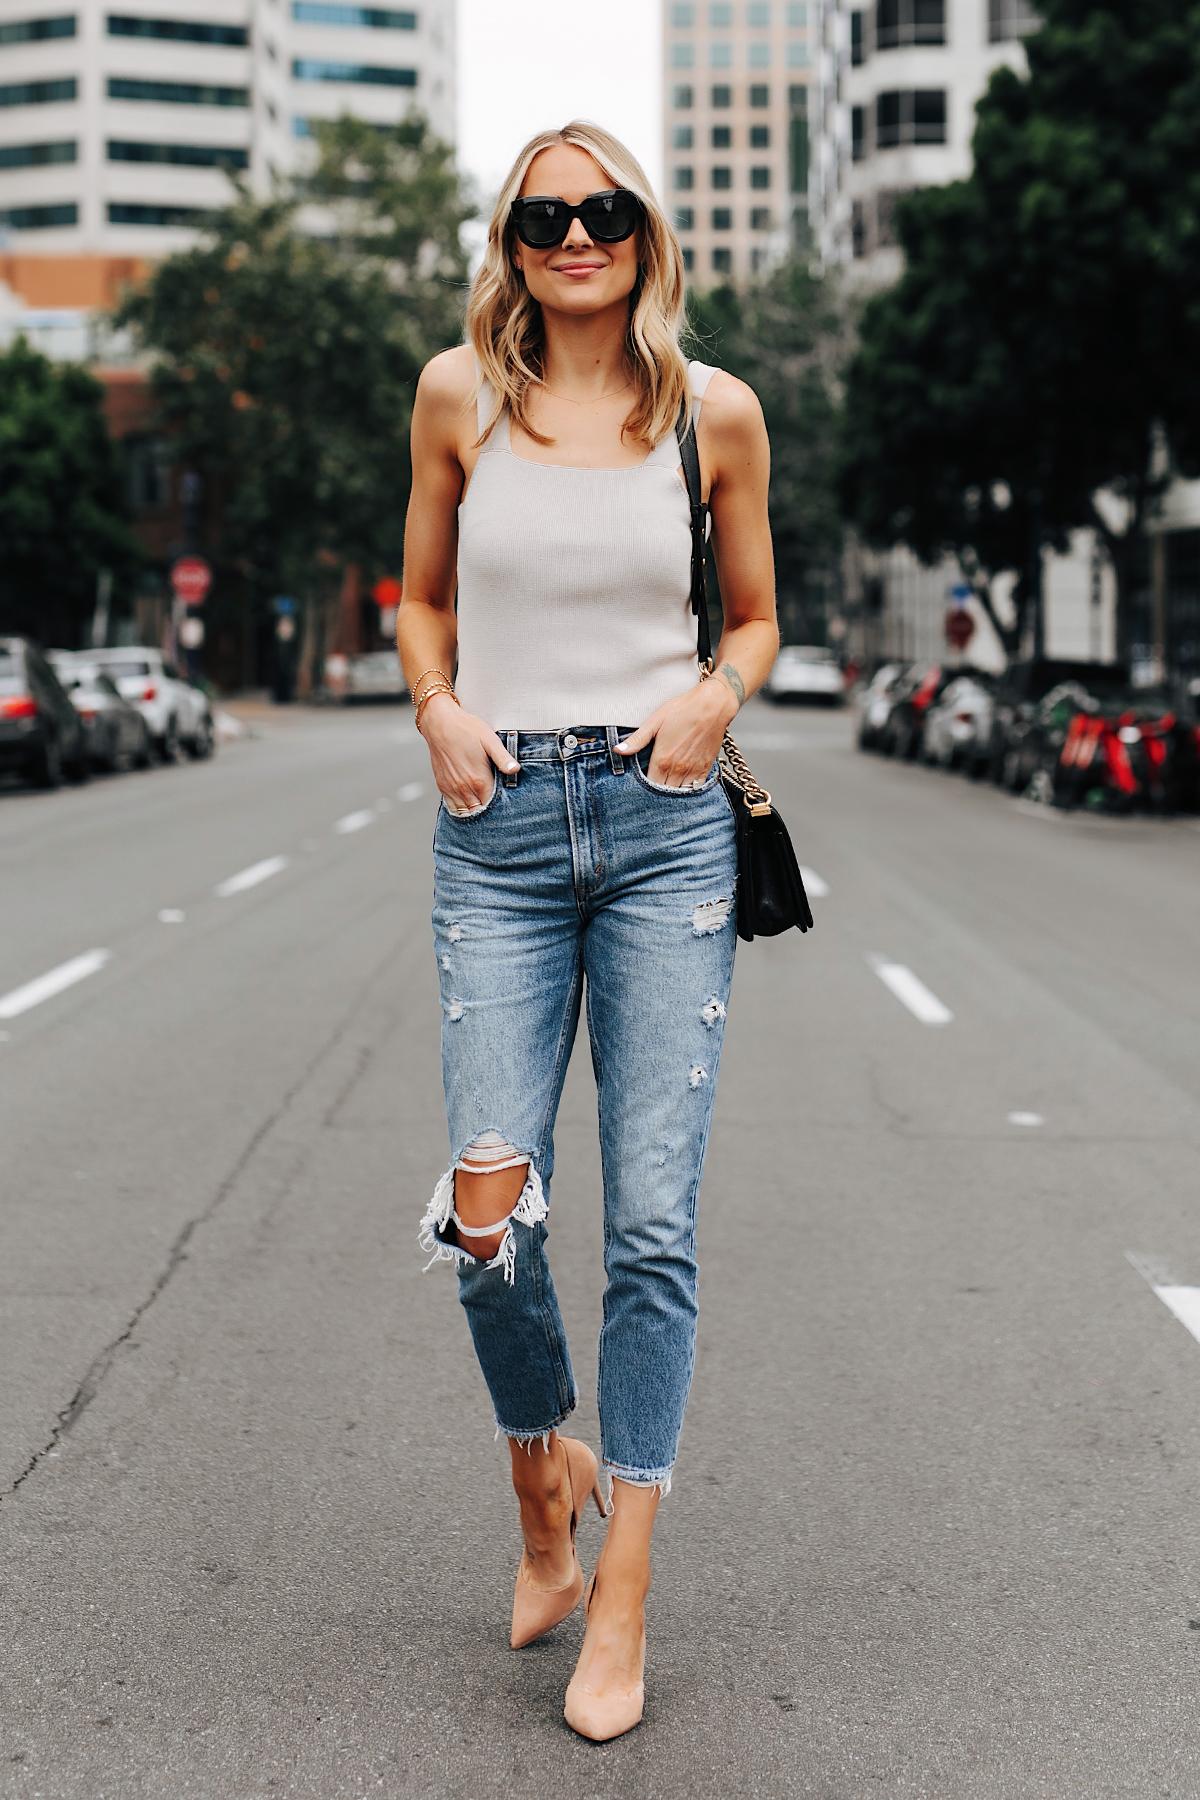 Fashion Jackson Wearing Beige Knit Tank Abercrombie Ripped Mom Jeans Tan Pumps